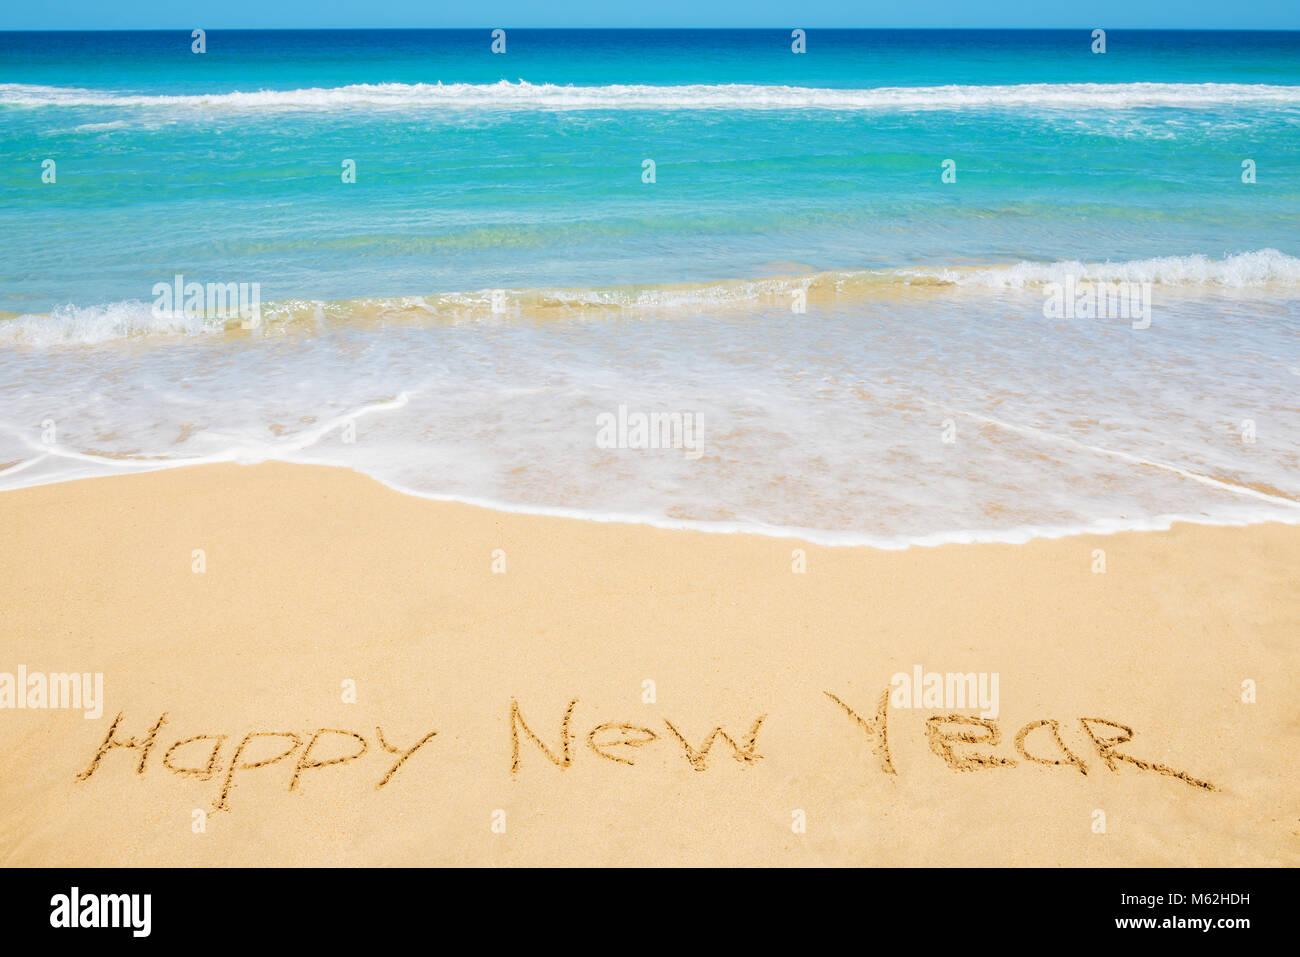 New Year Message Stockfotos & New Year Message Bilder - Alamy